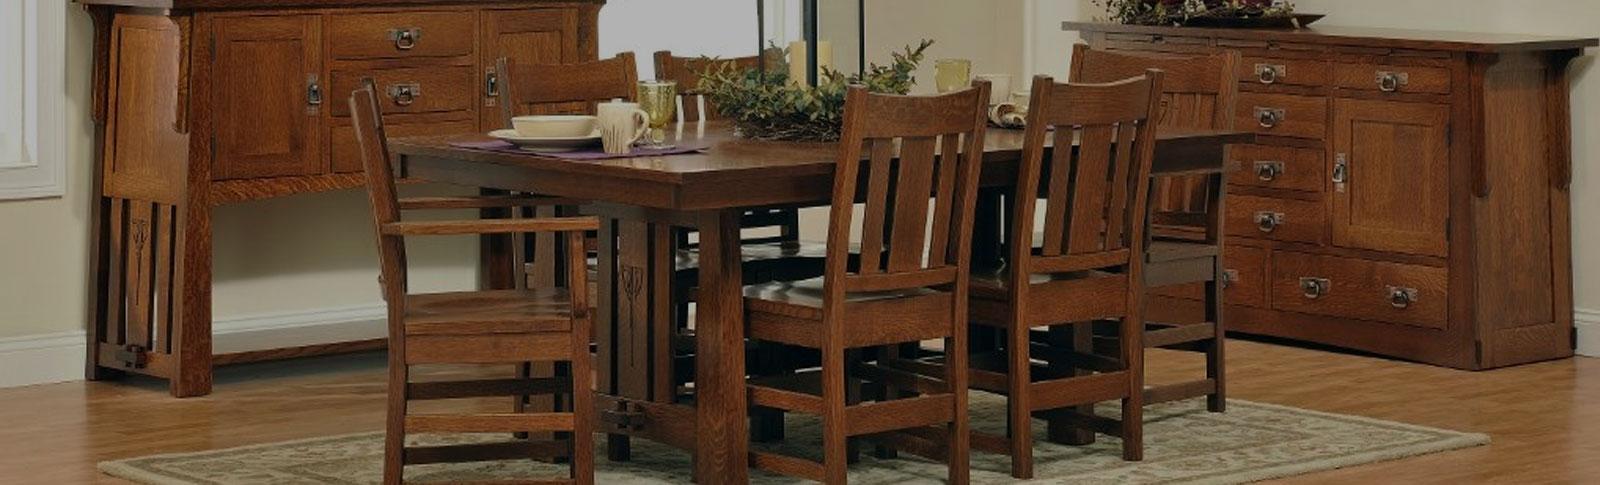 Custom Wood Furniture In A Local Artisans American Craftsmen